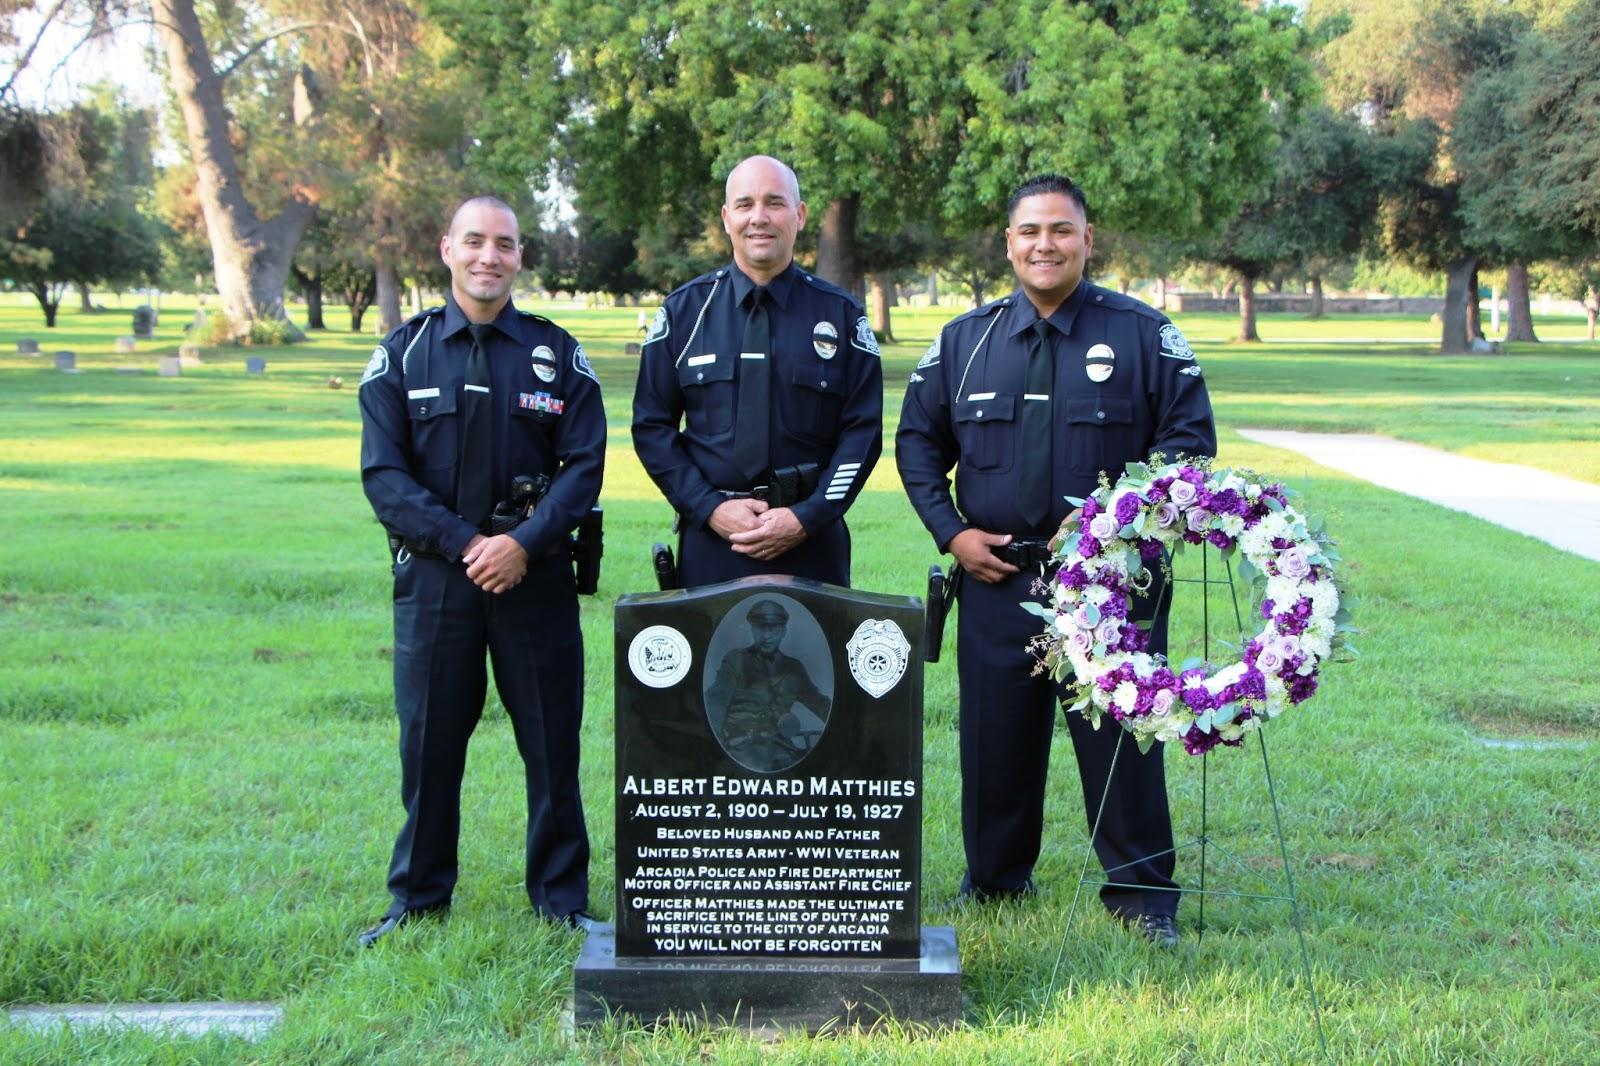 Arcadia Police Department News & Information Blog: July 2013